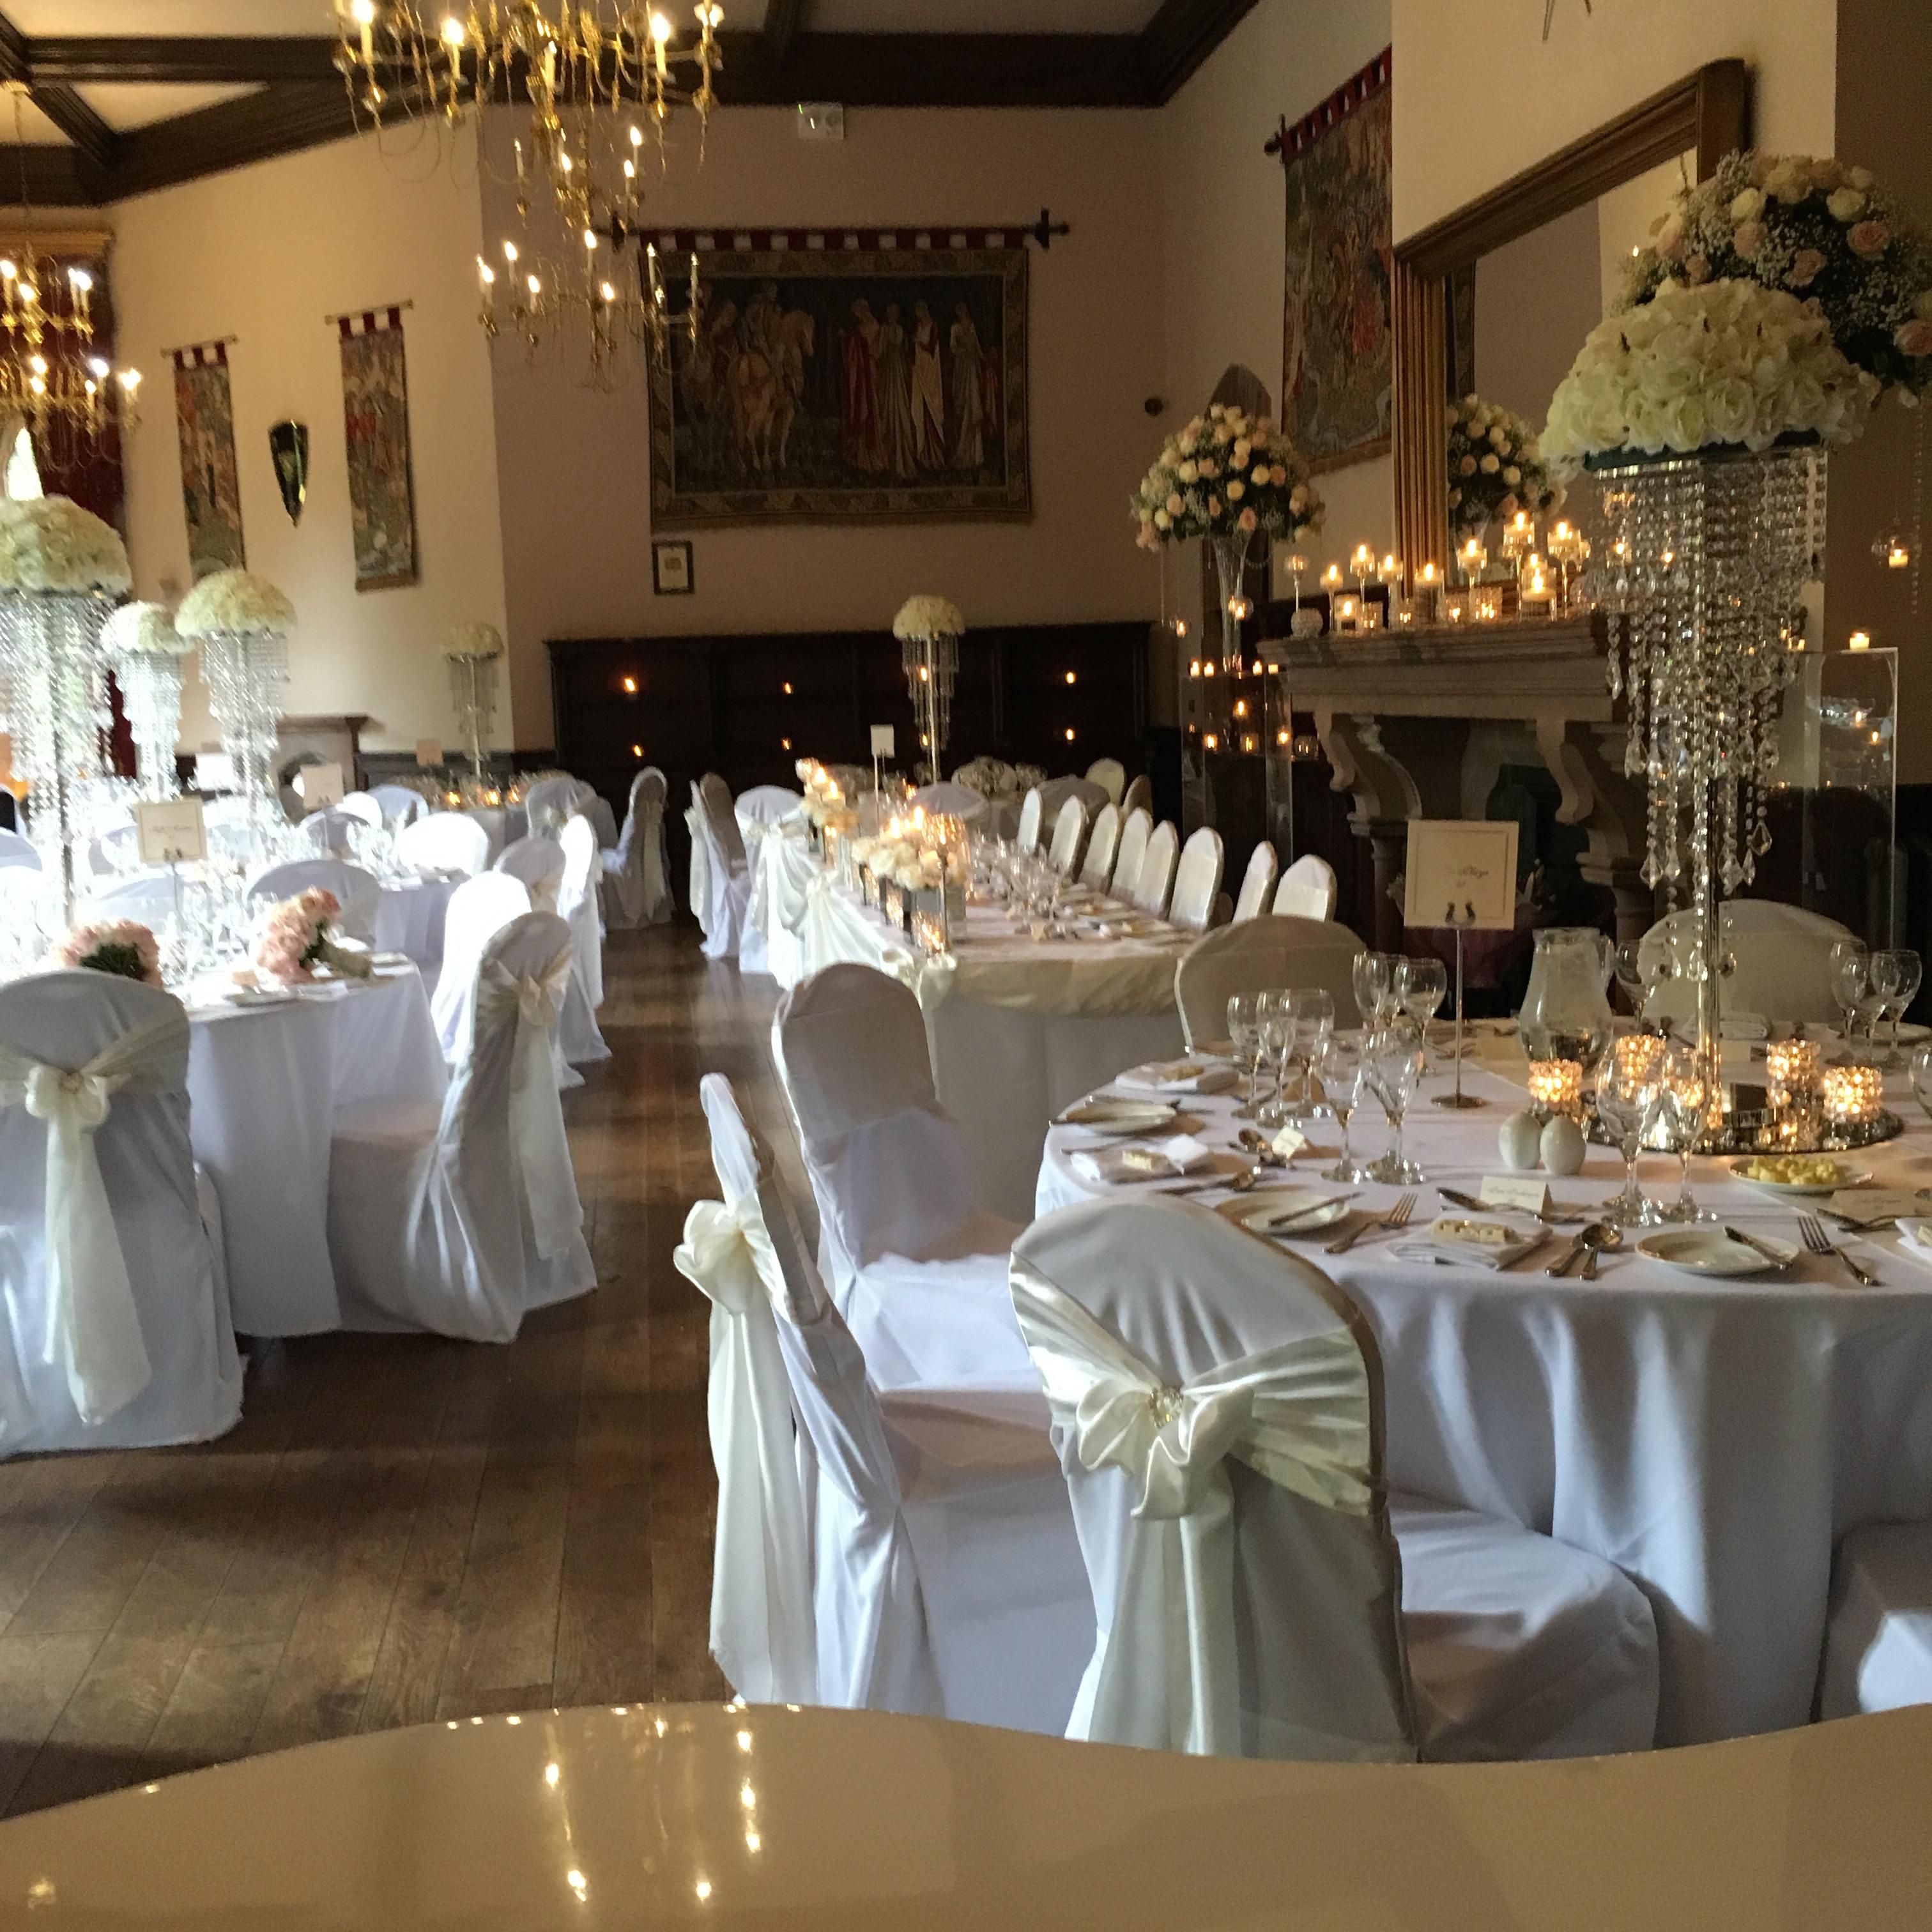 Pianist Peckforton Castle wedding ceremony music